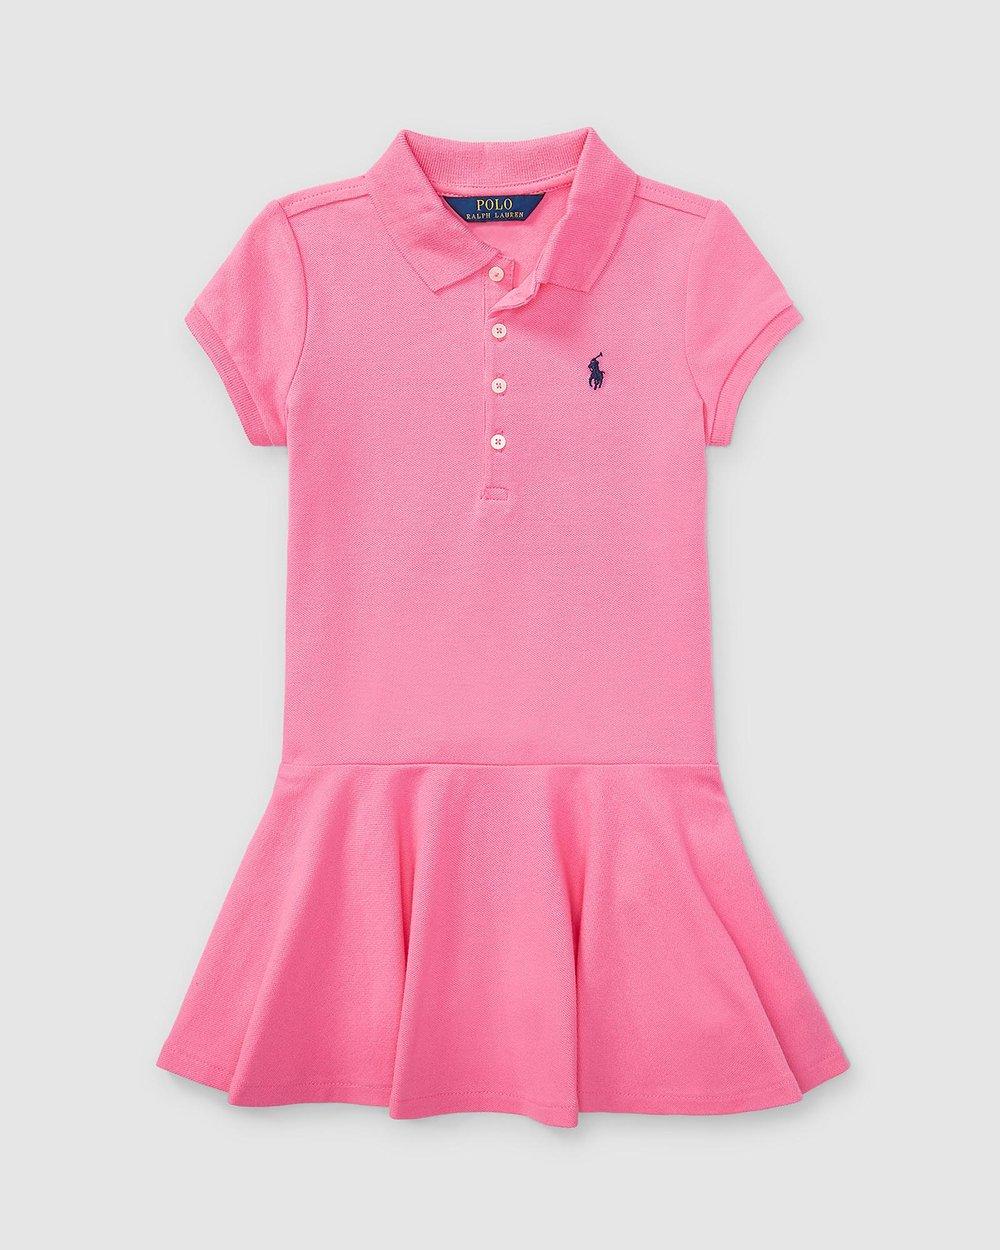 daa1624cd Polo Dress - Kids by Polo Ralph Lauren Online